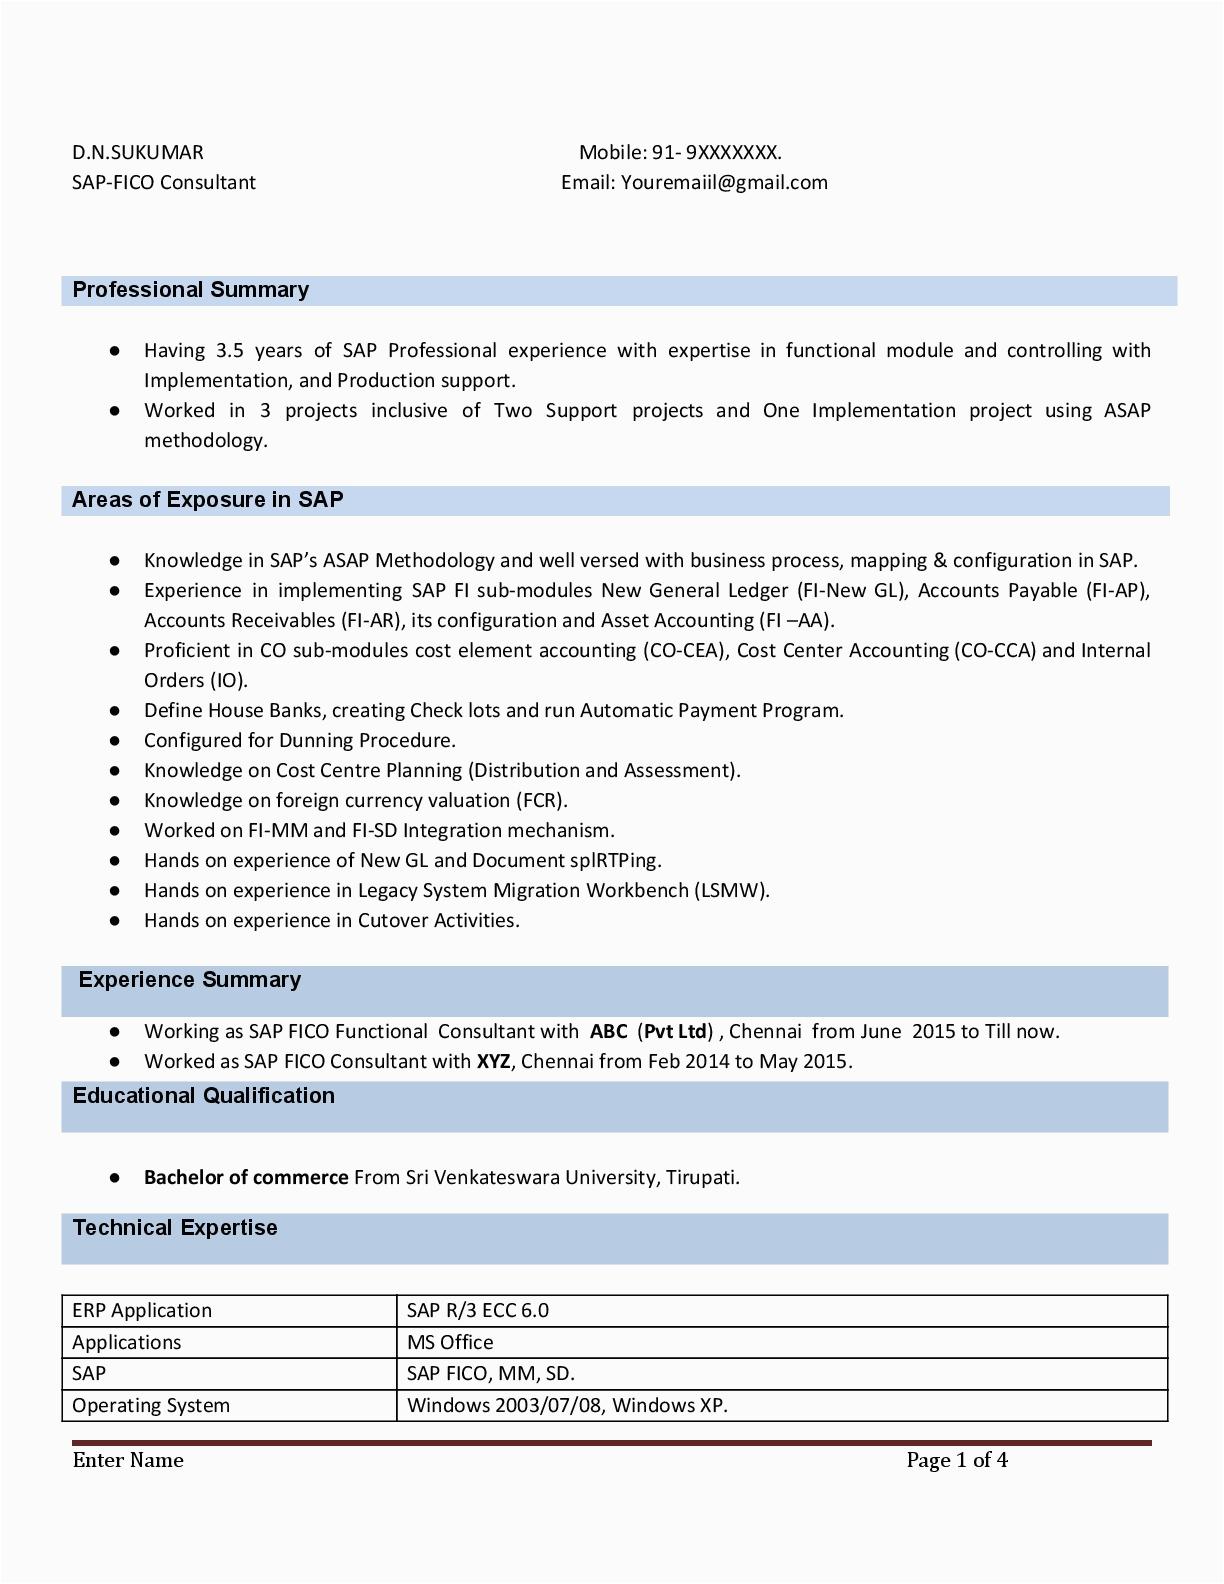 Sap Fico Sample Resume for Experienced Sap Fico Resume Sample Resume Sample